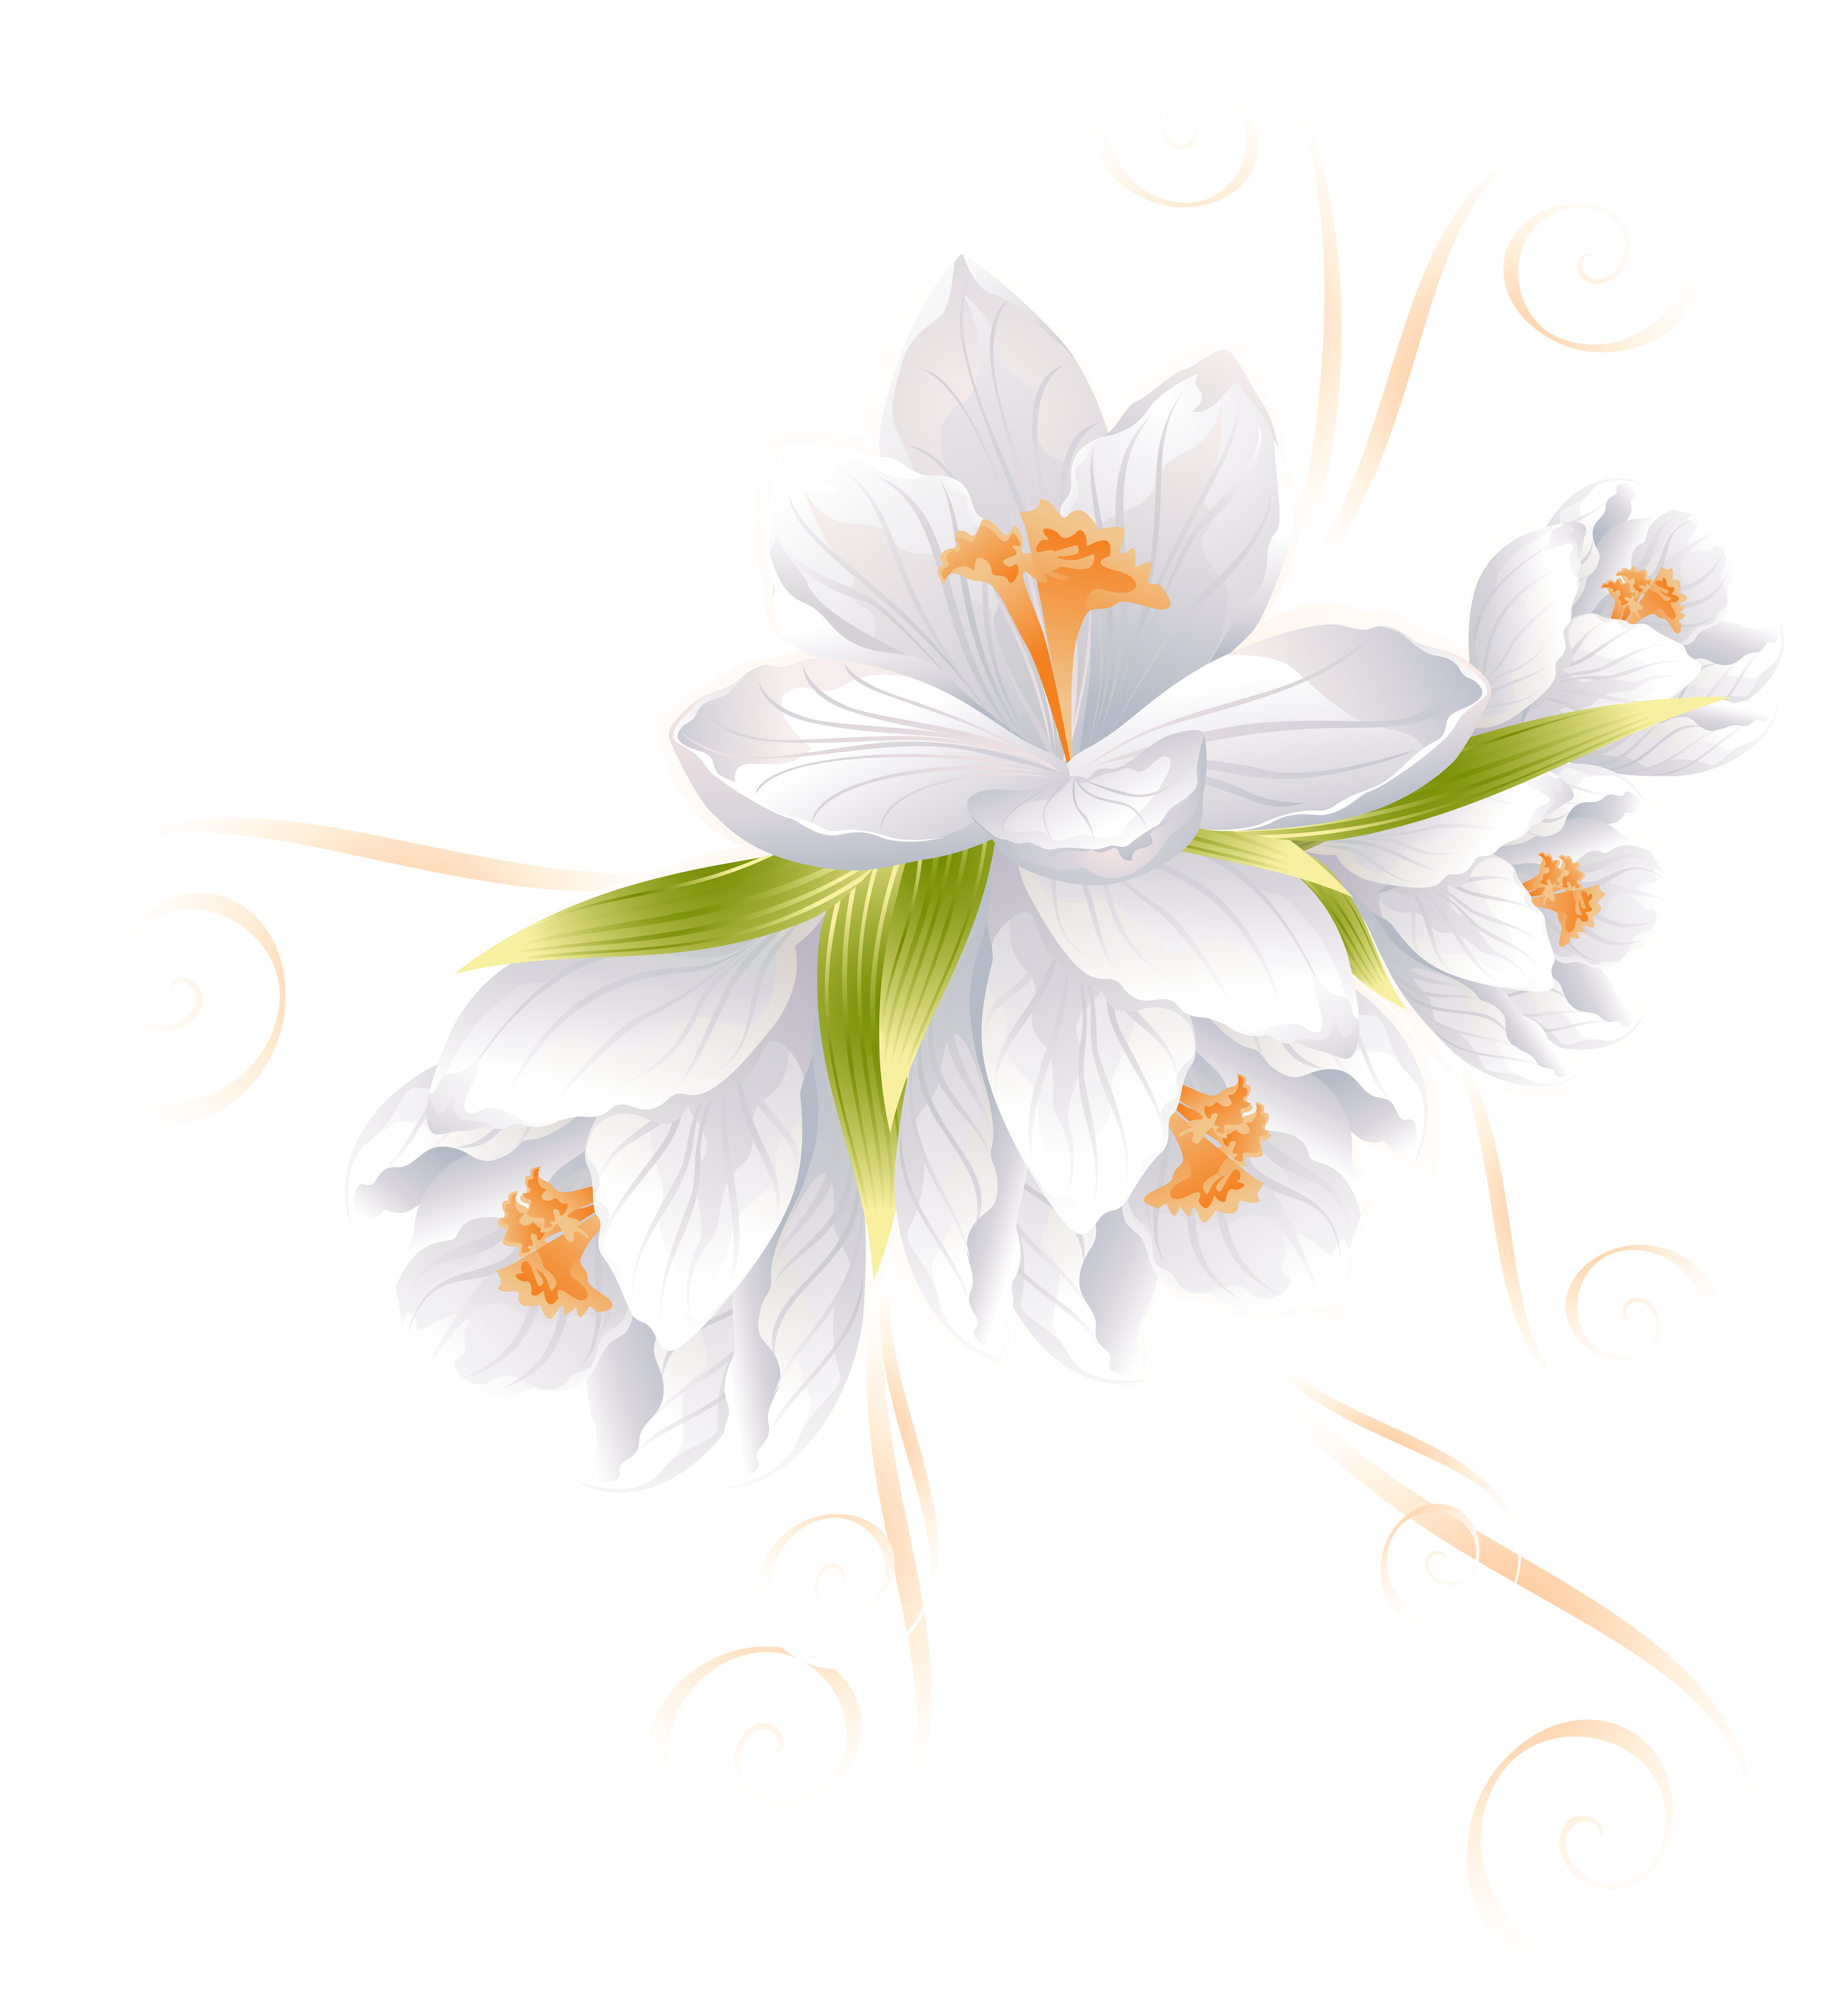 White clipart transparent vector royalty free download White Flower Decor Transparent PNG Clip Art Image | Gallery ... vector royalty free download